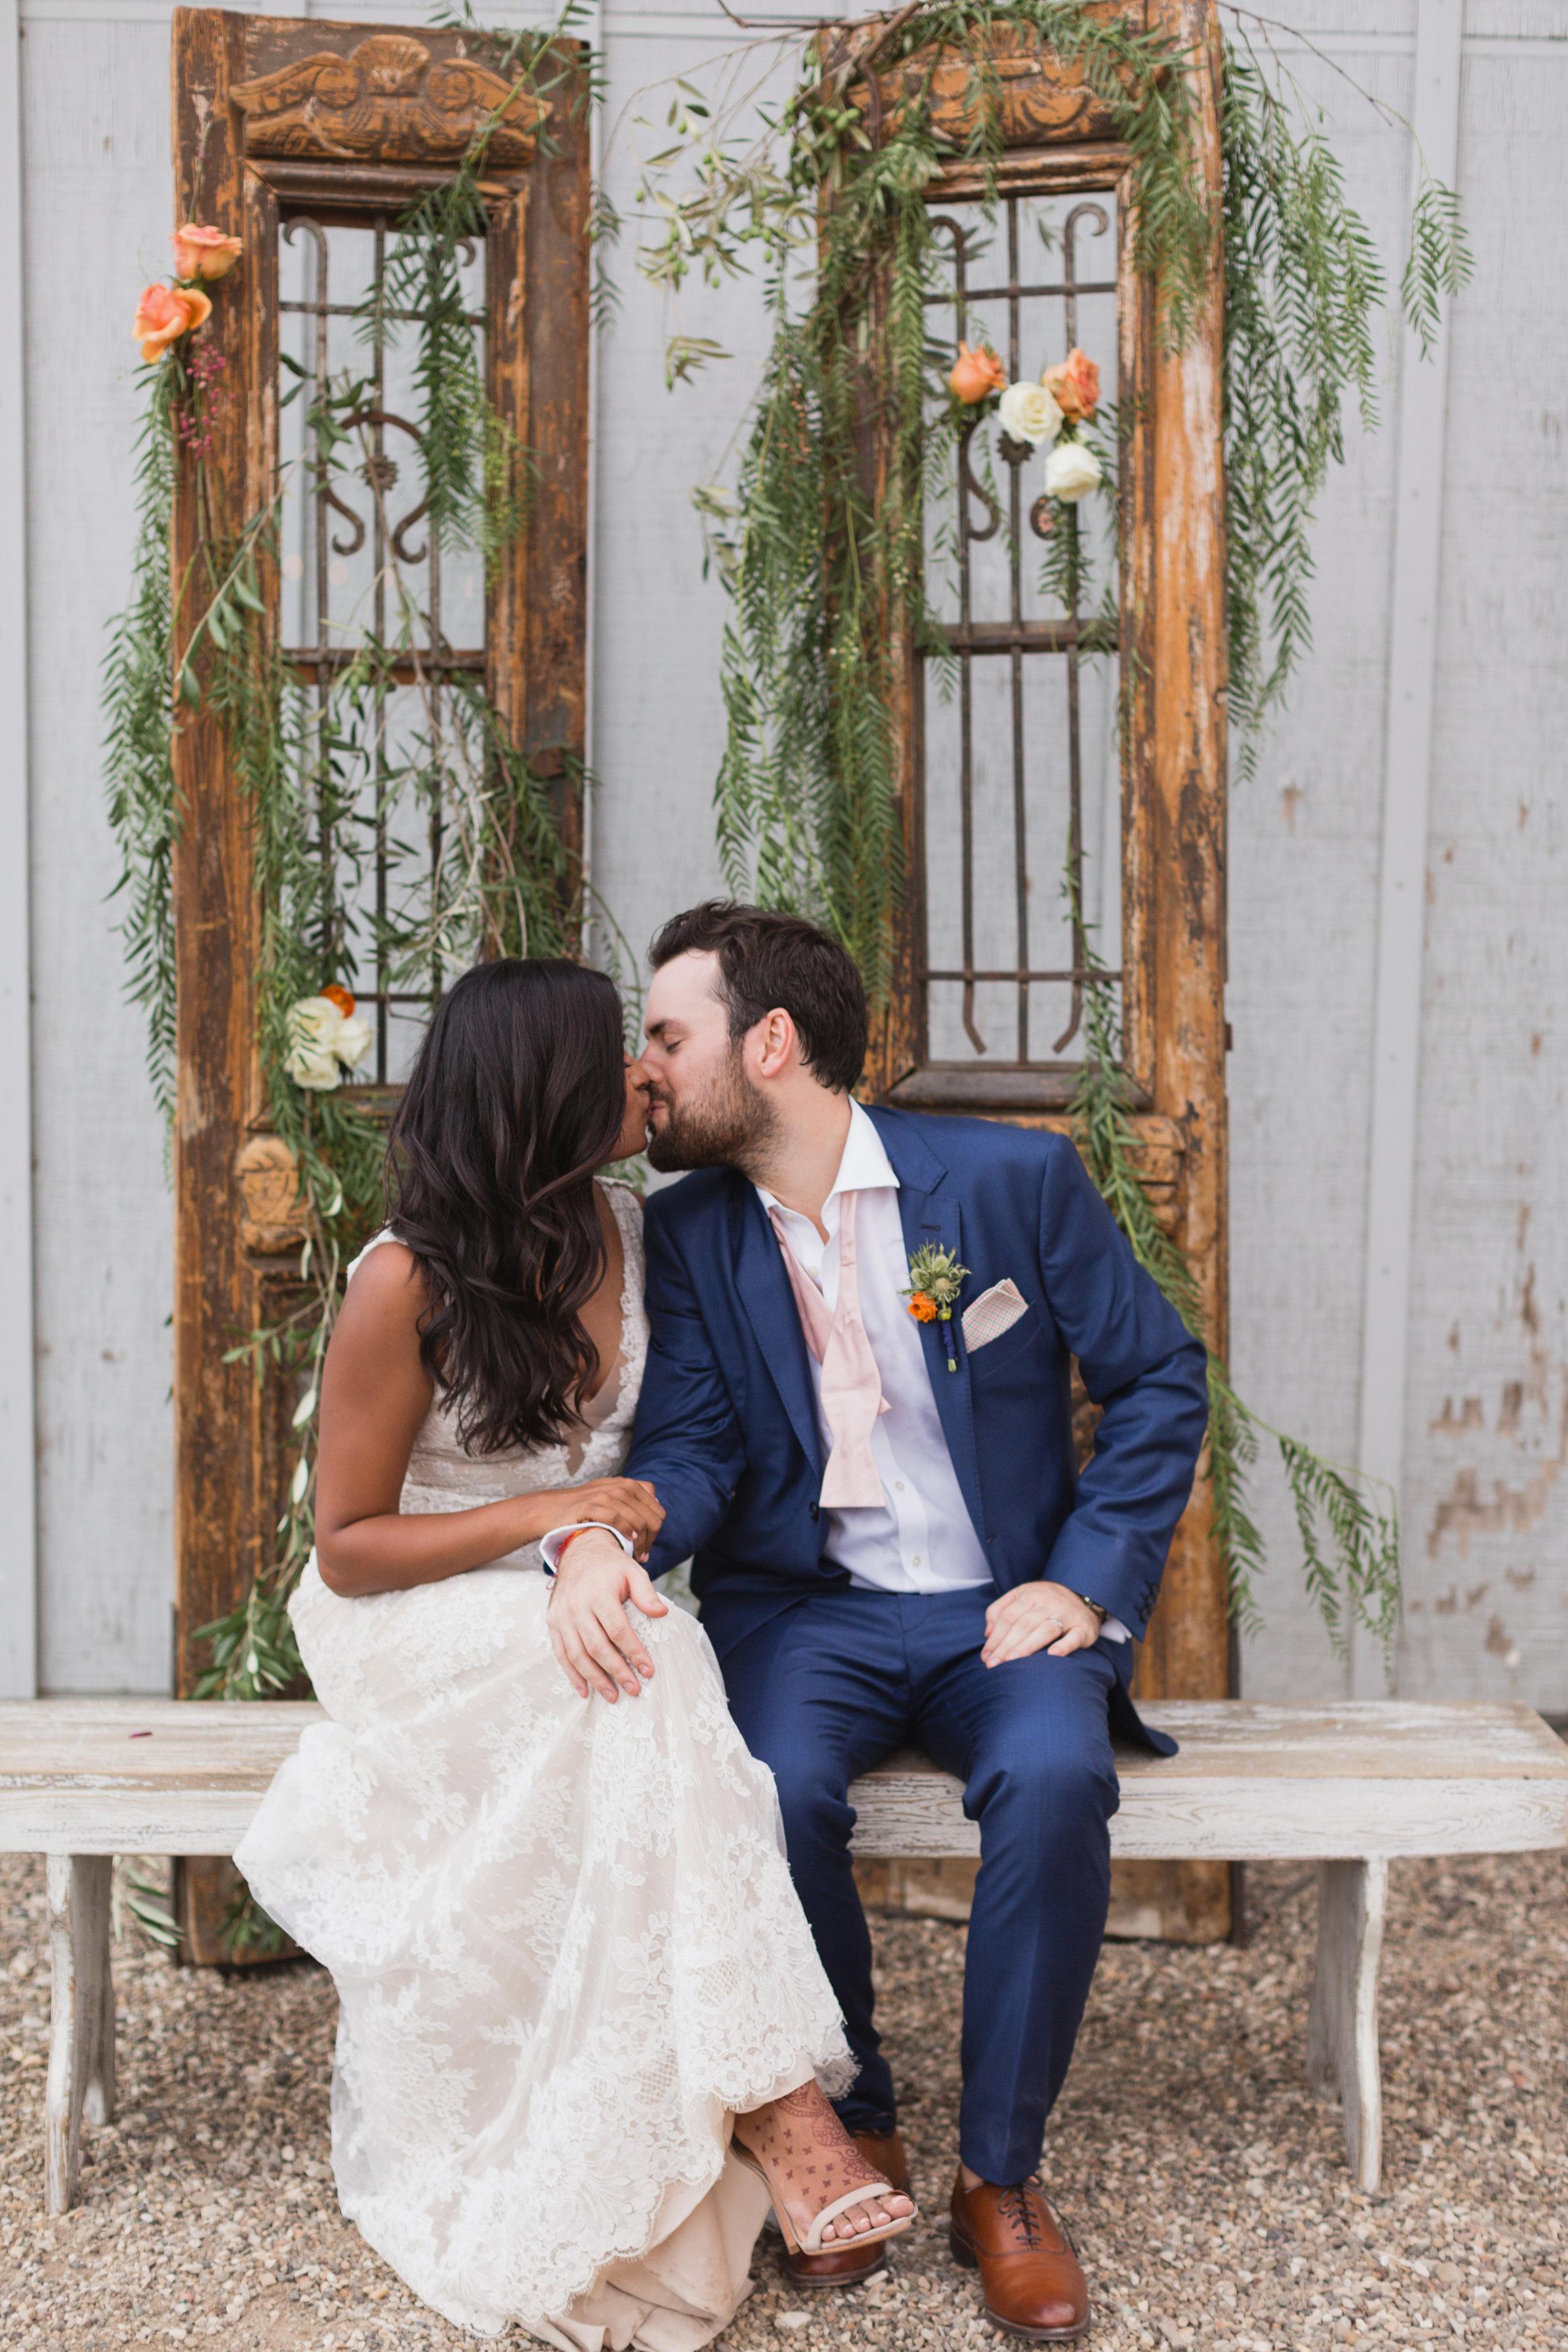 kosha and adam wedding couple sitting and kissing